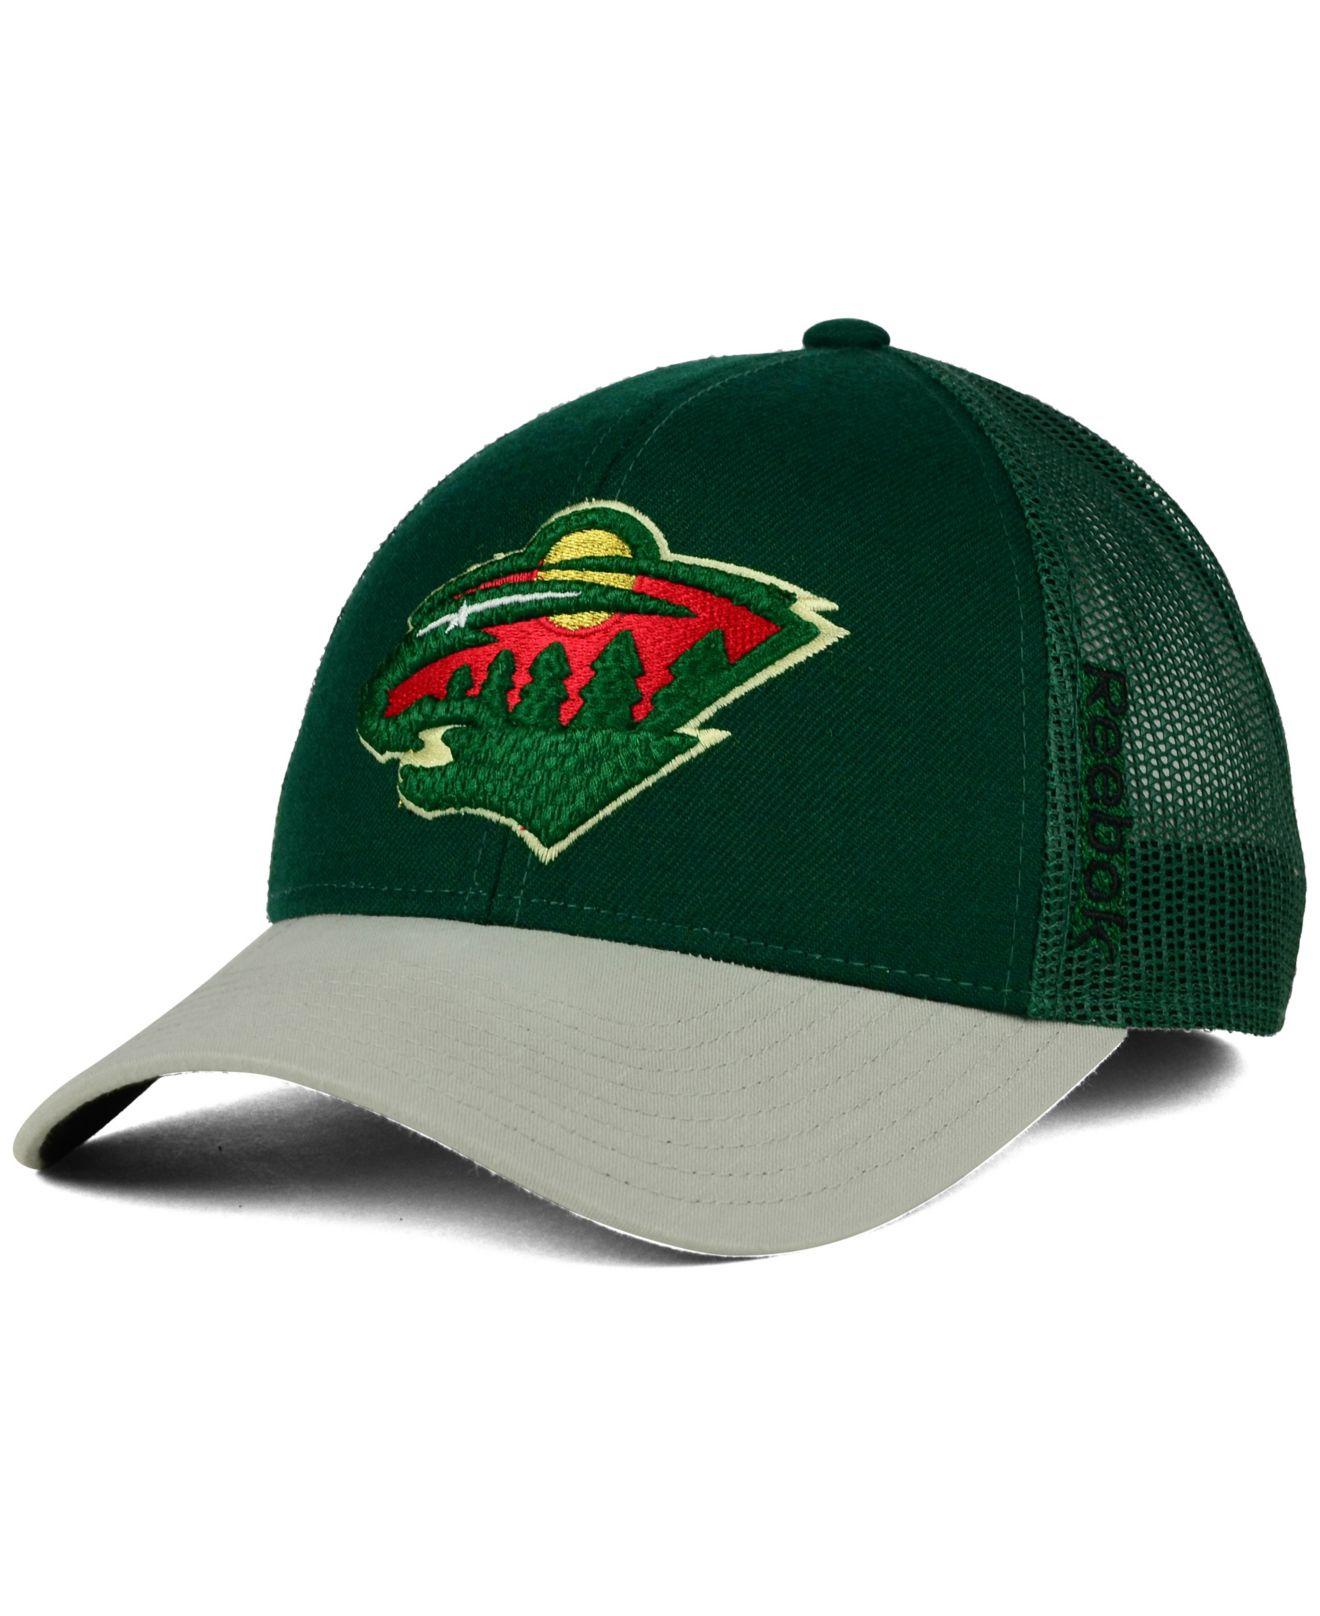 3d4ca3705a7 Lyst - Reebok Minnesota Wild Tnt Adjustable Cap in Green for Men